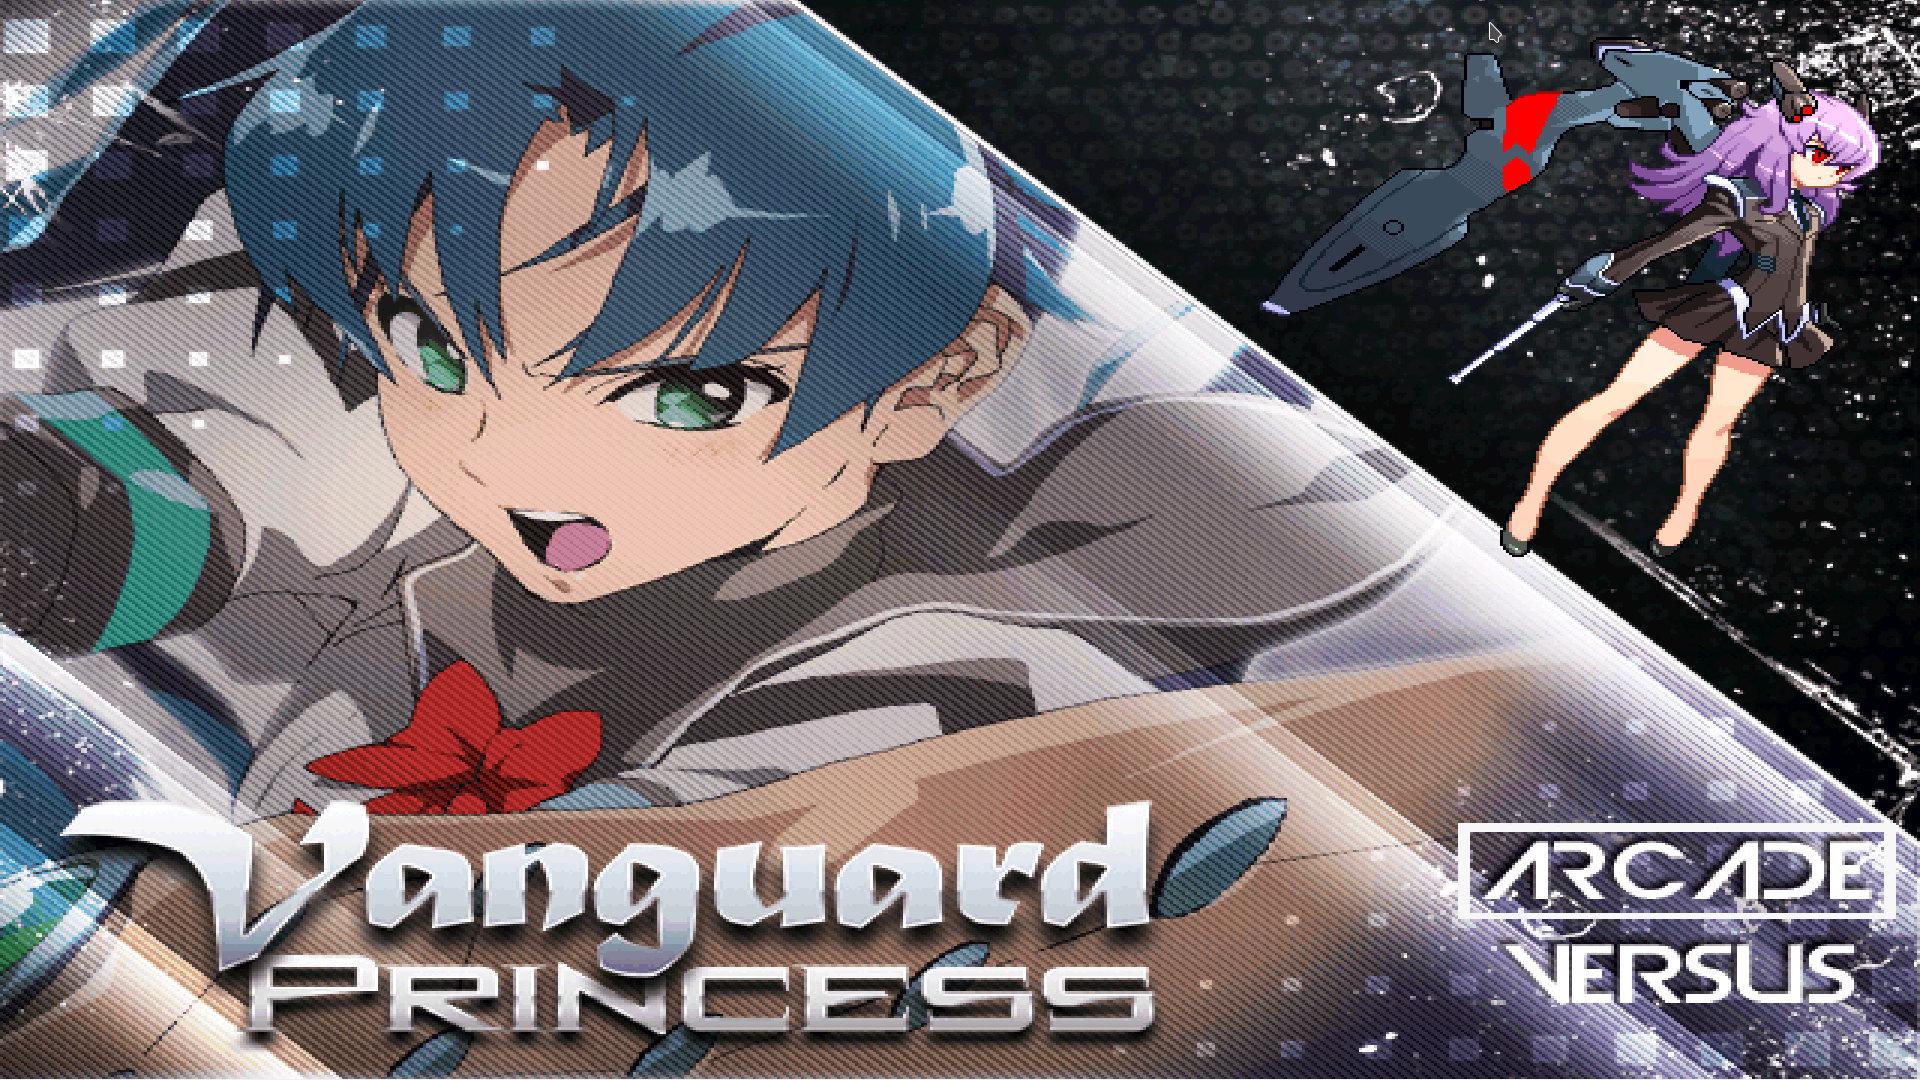 Vanguard Princess Title Screen